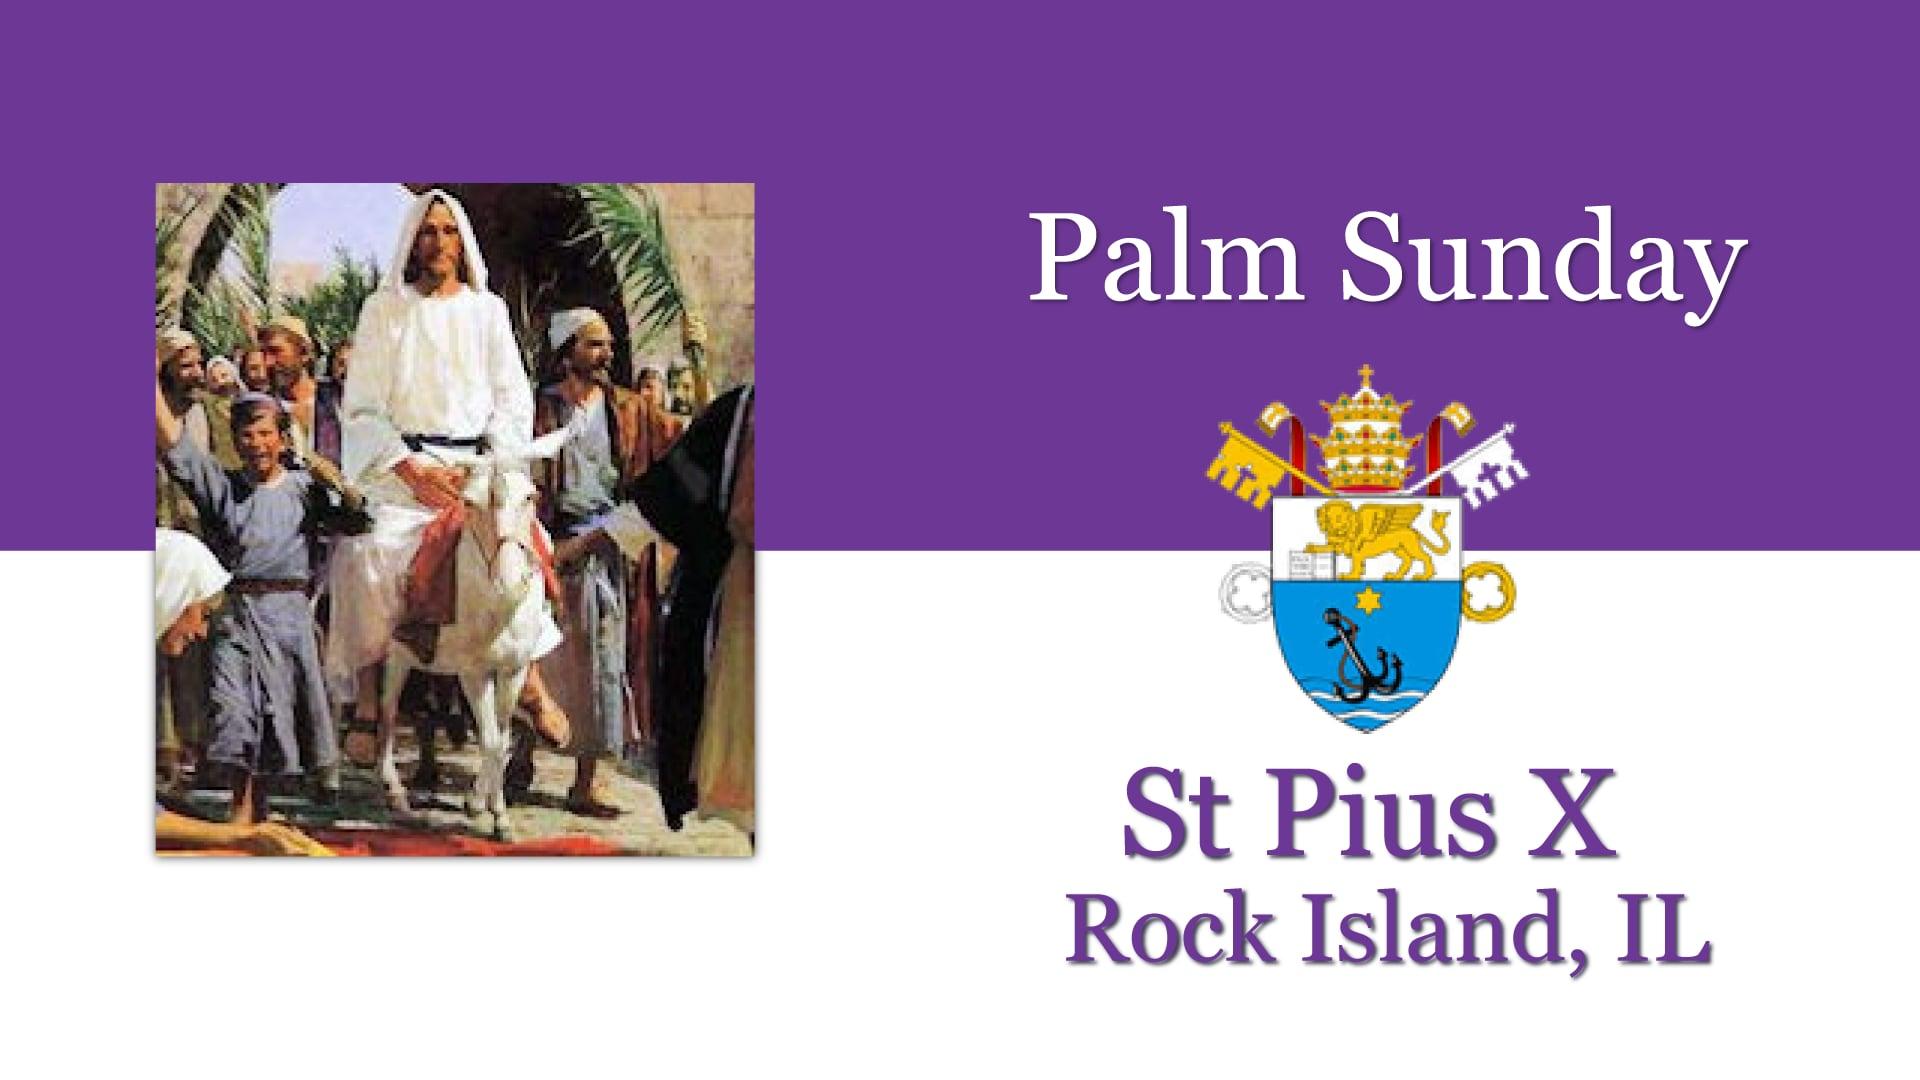 Palm Sunday, March 28th, St Pius X, Rock Island